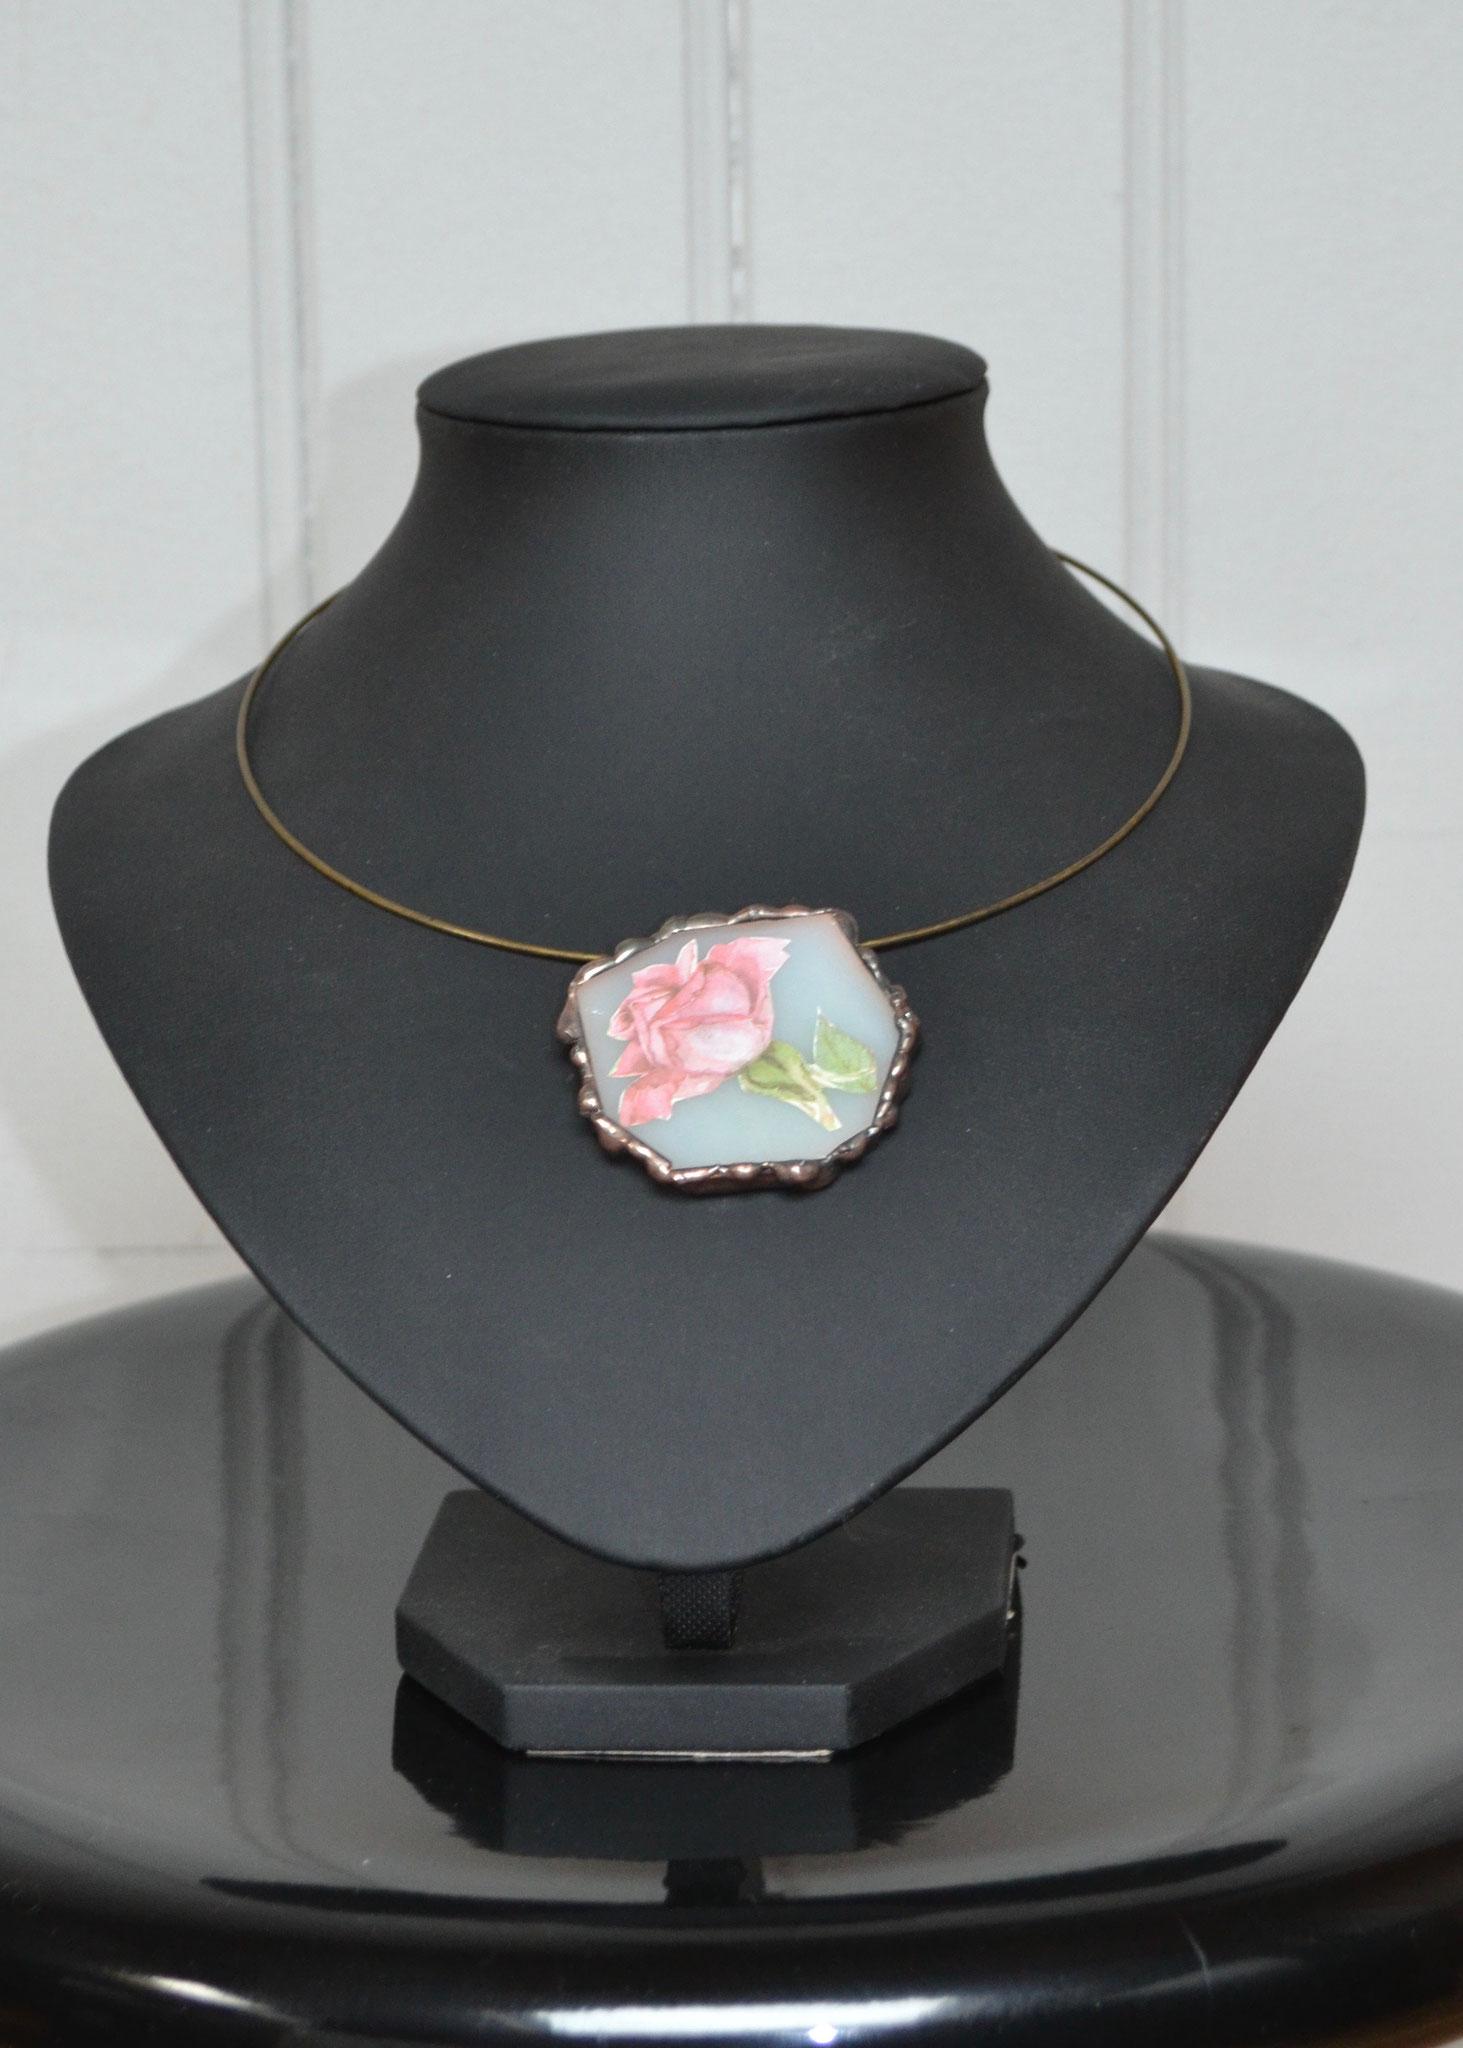 Pendentif Tiffany inclusion image rose (4,5 x 4,5 cm) 19€    Ref: PE5